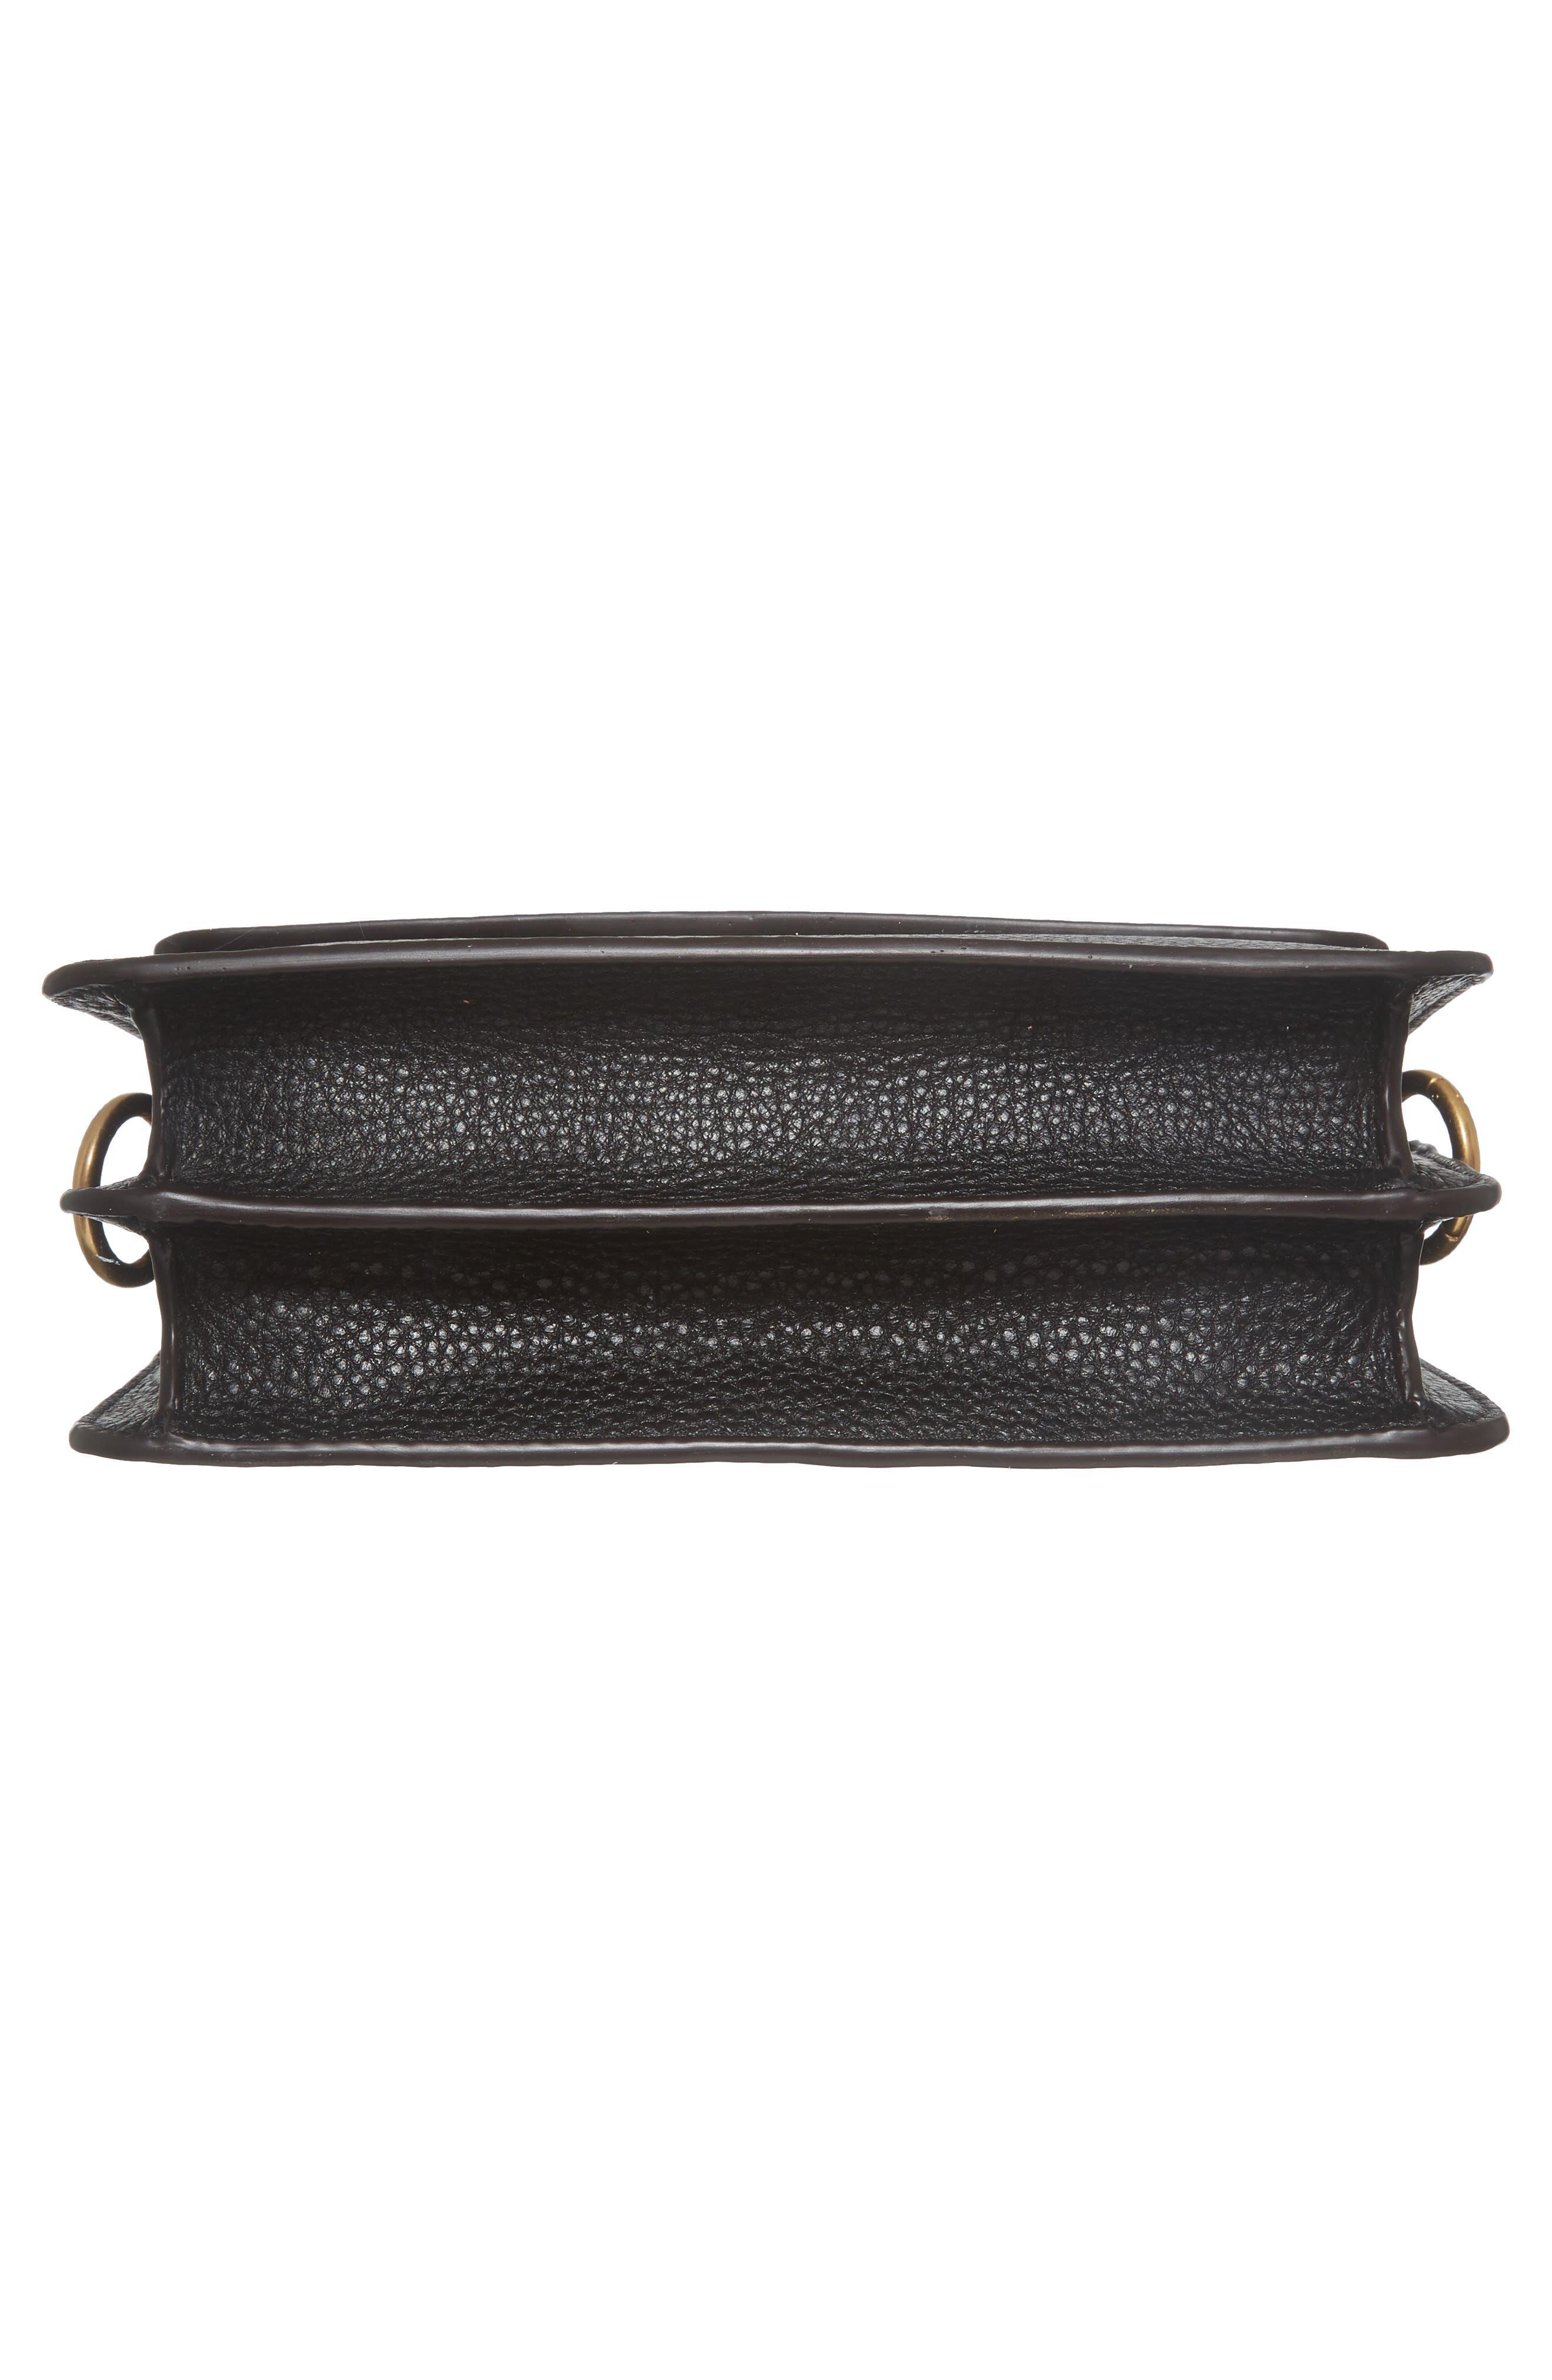 McGraw Leather Shoulder Bag,                             Alternate thumbnail 6, color,                             001